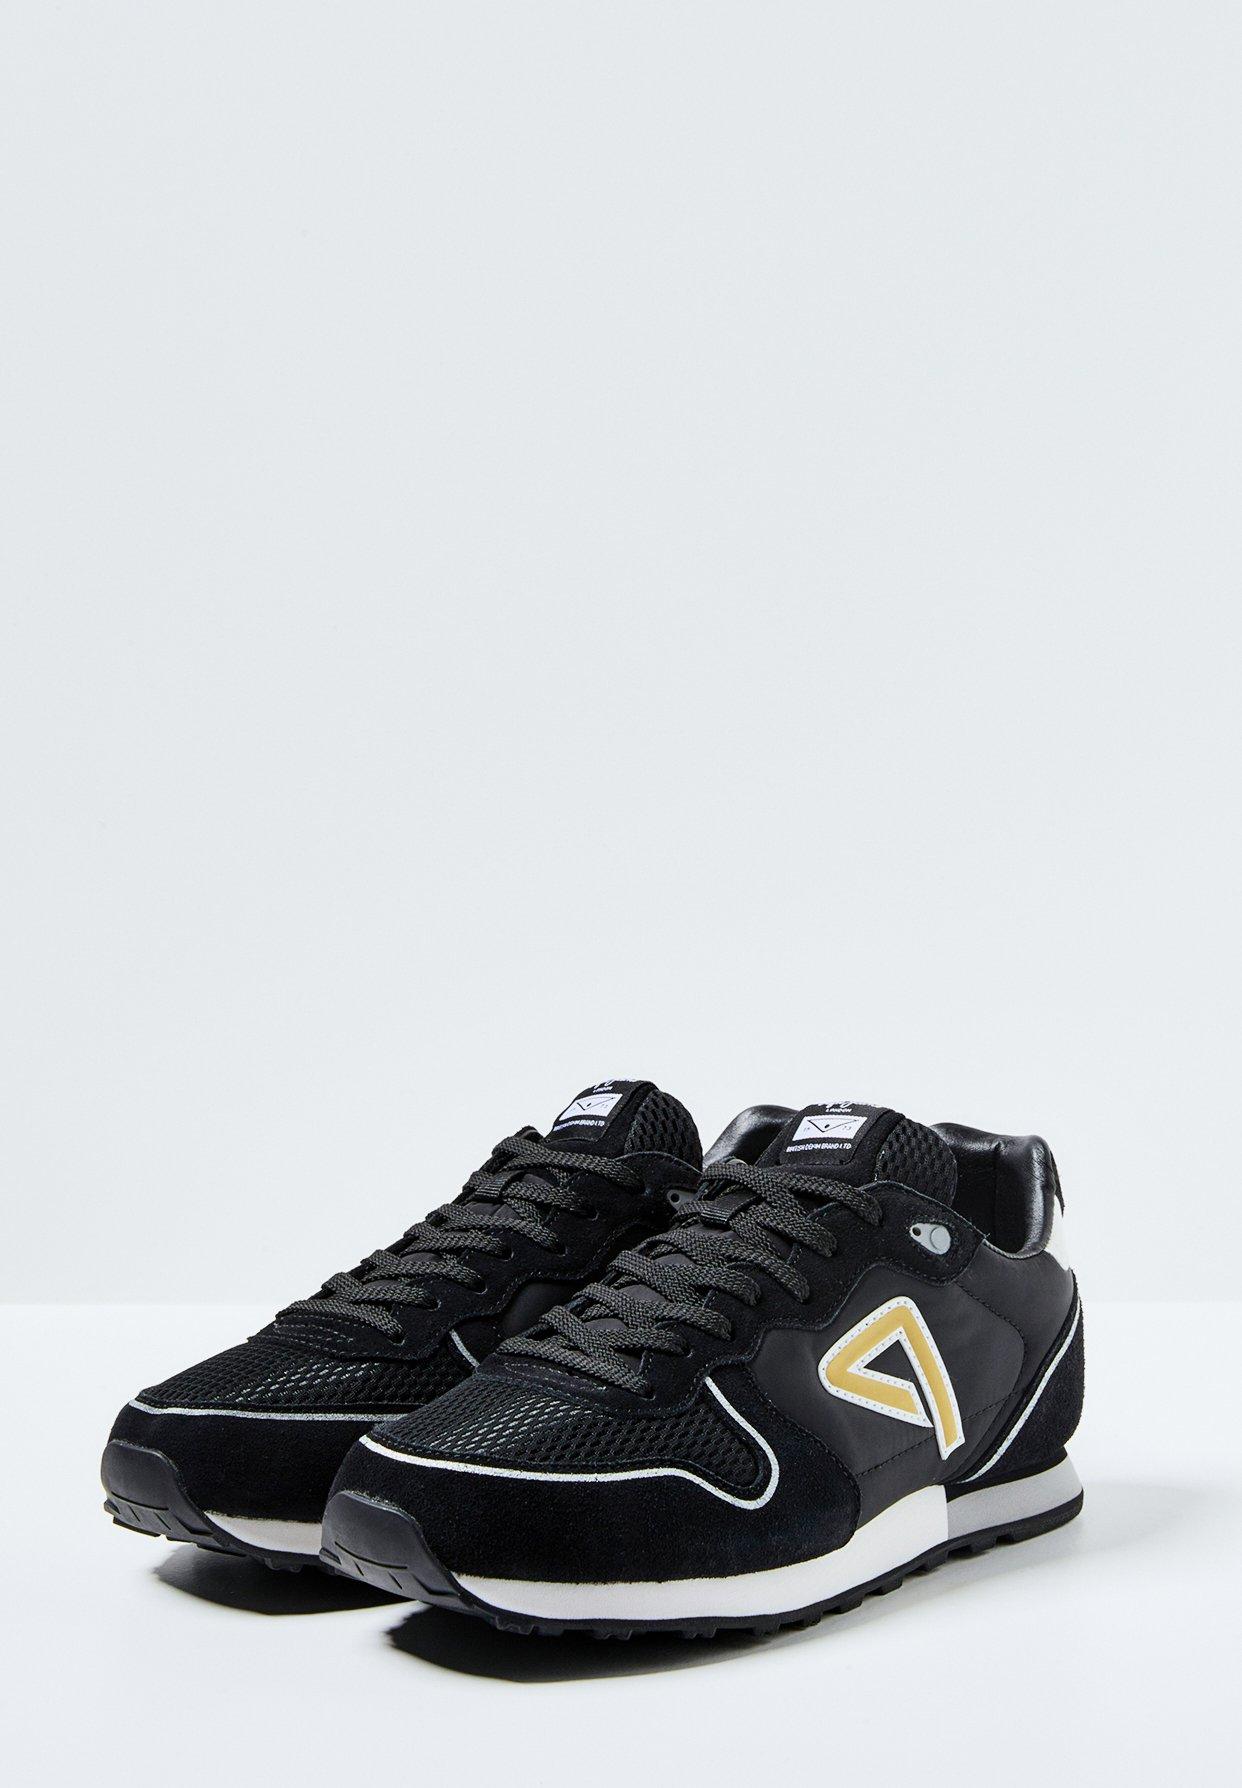 Pepe Jeans KLEIN - Sneaker low - anthracite/dunkelgrau - Herrenschuhe n3Dkt